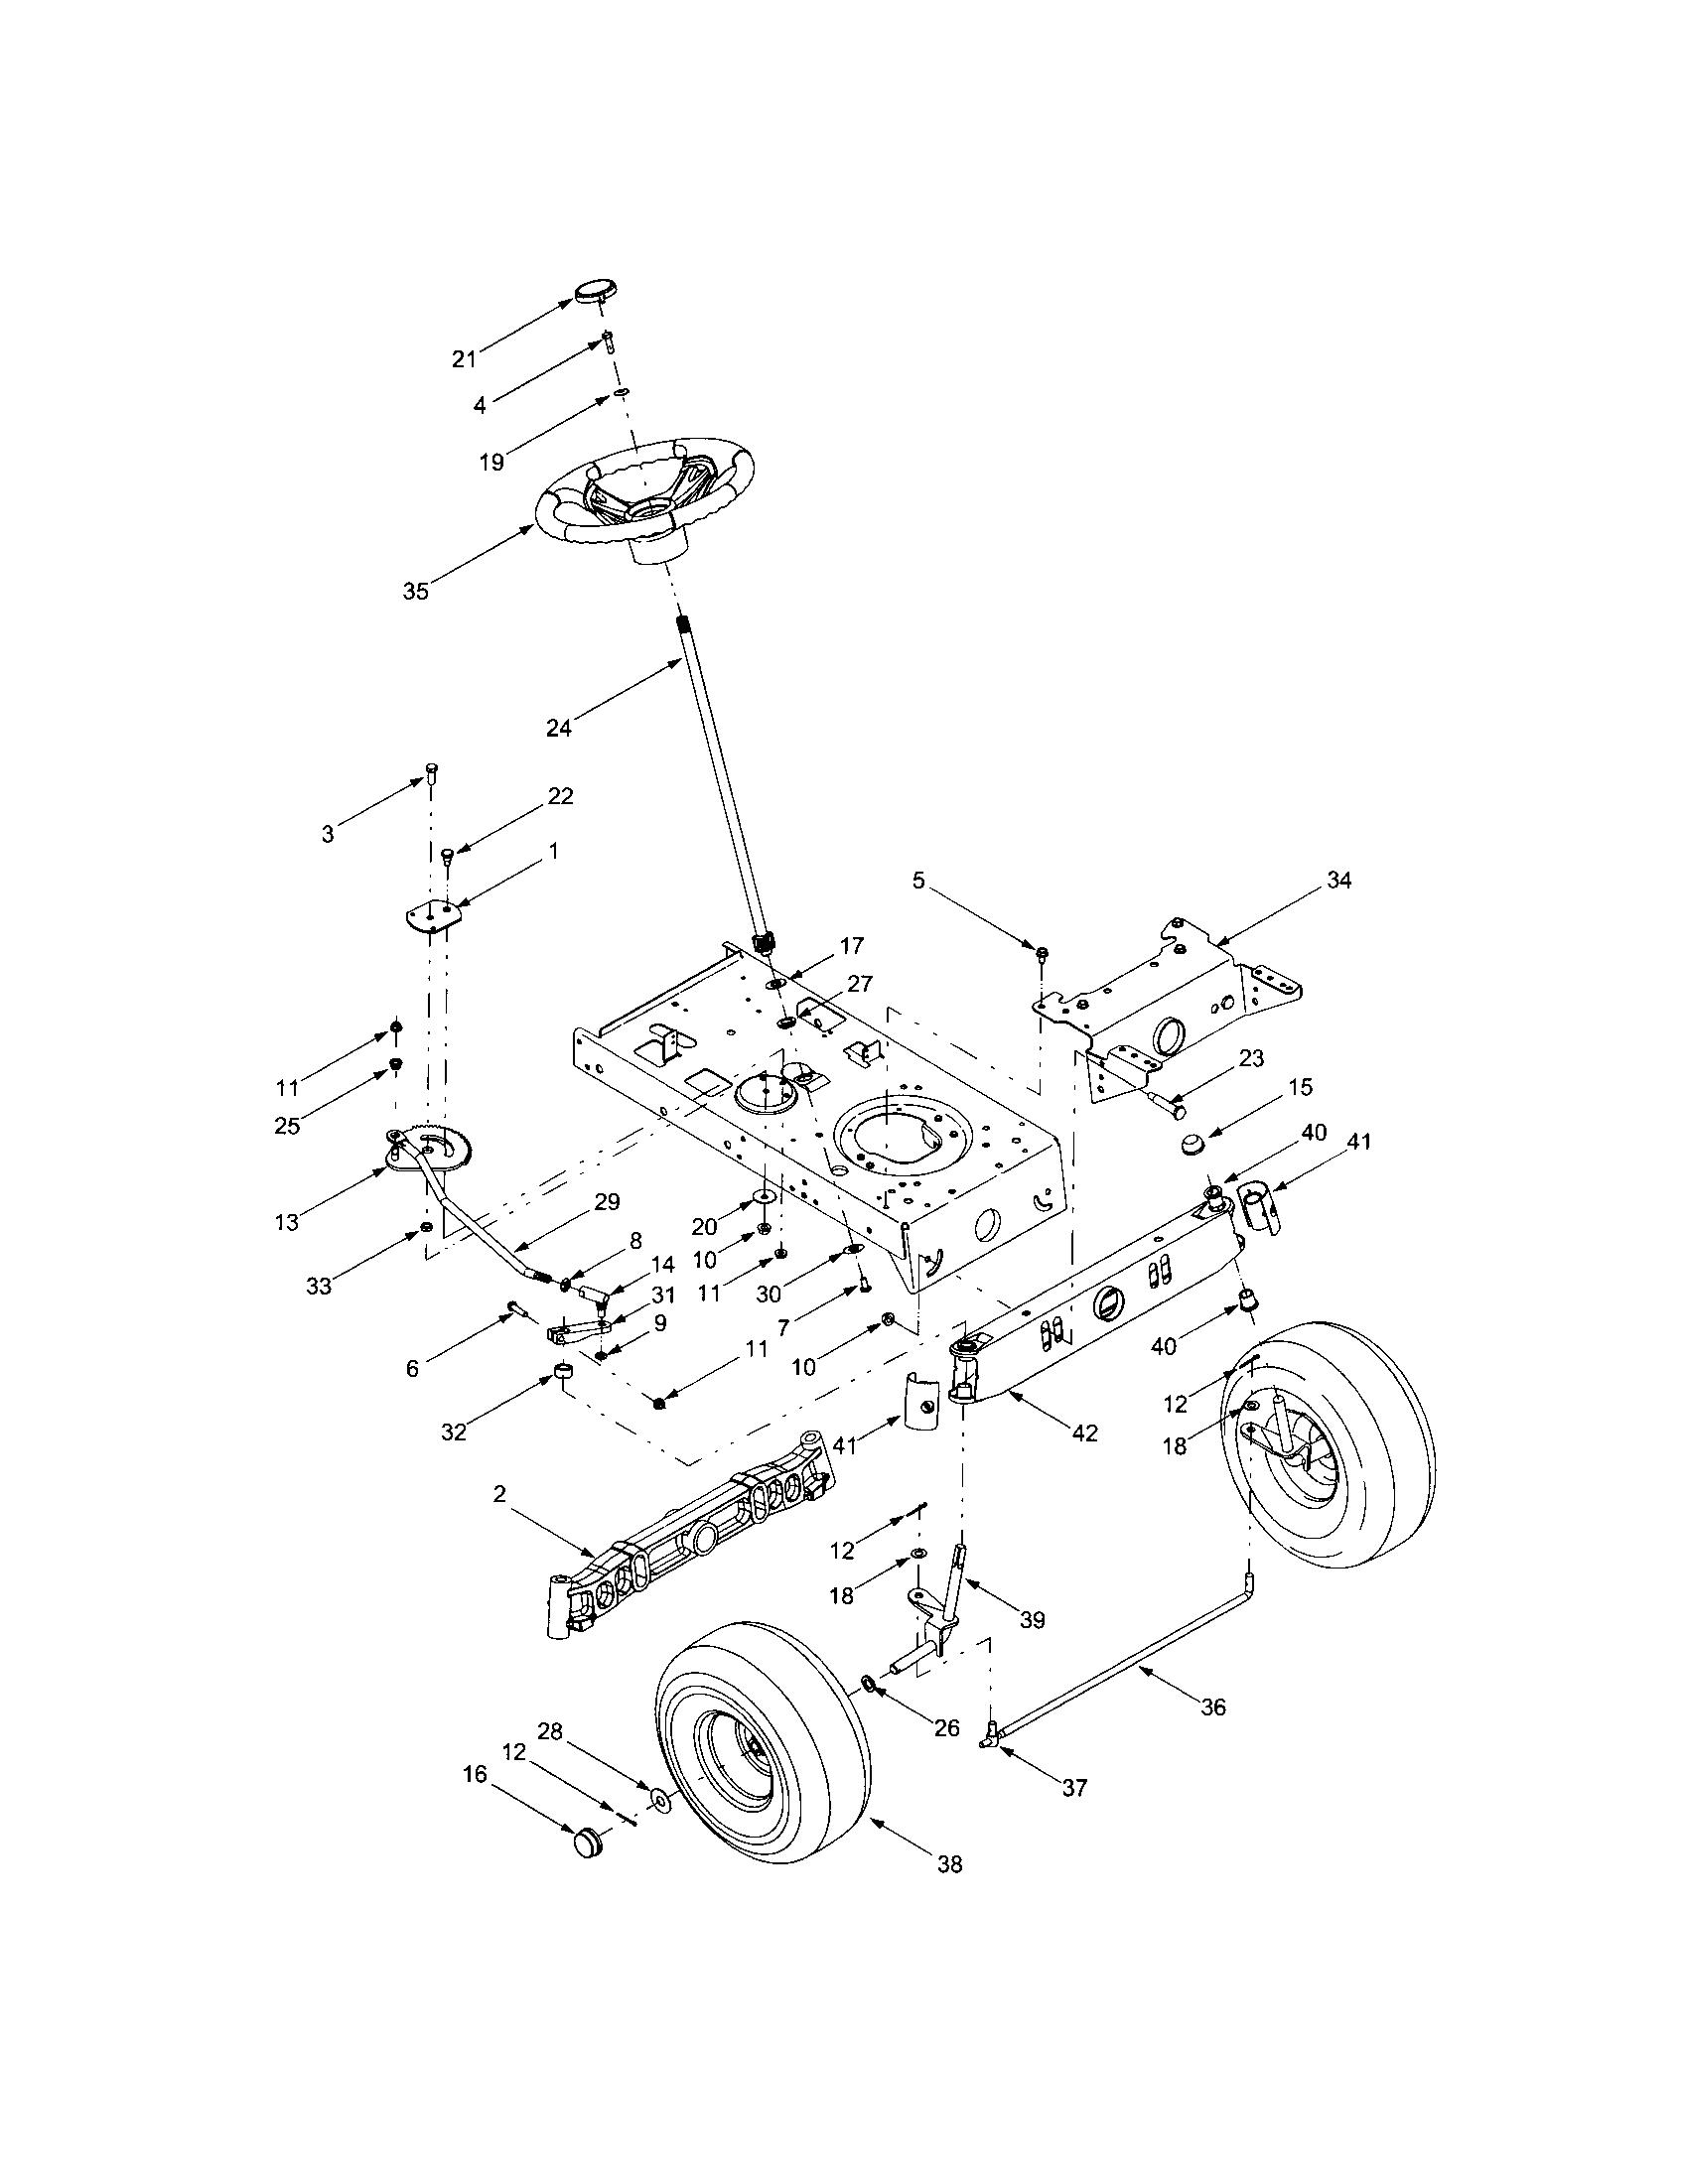 2004 cavalier stereo wiring diagram